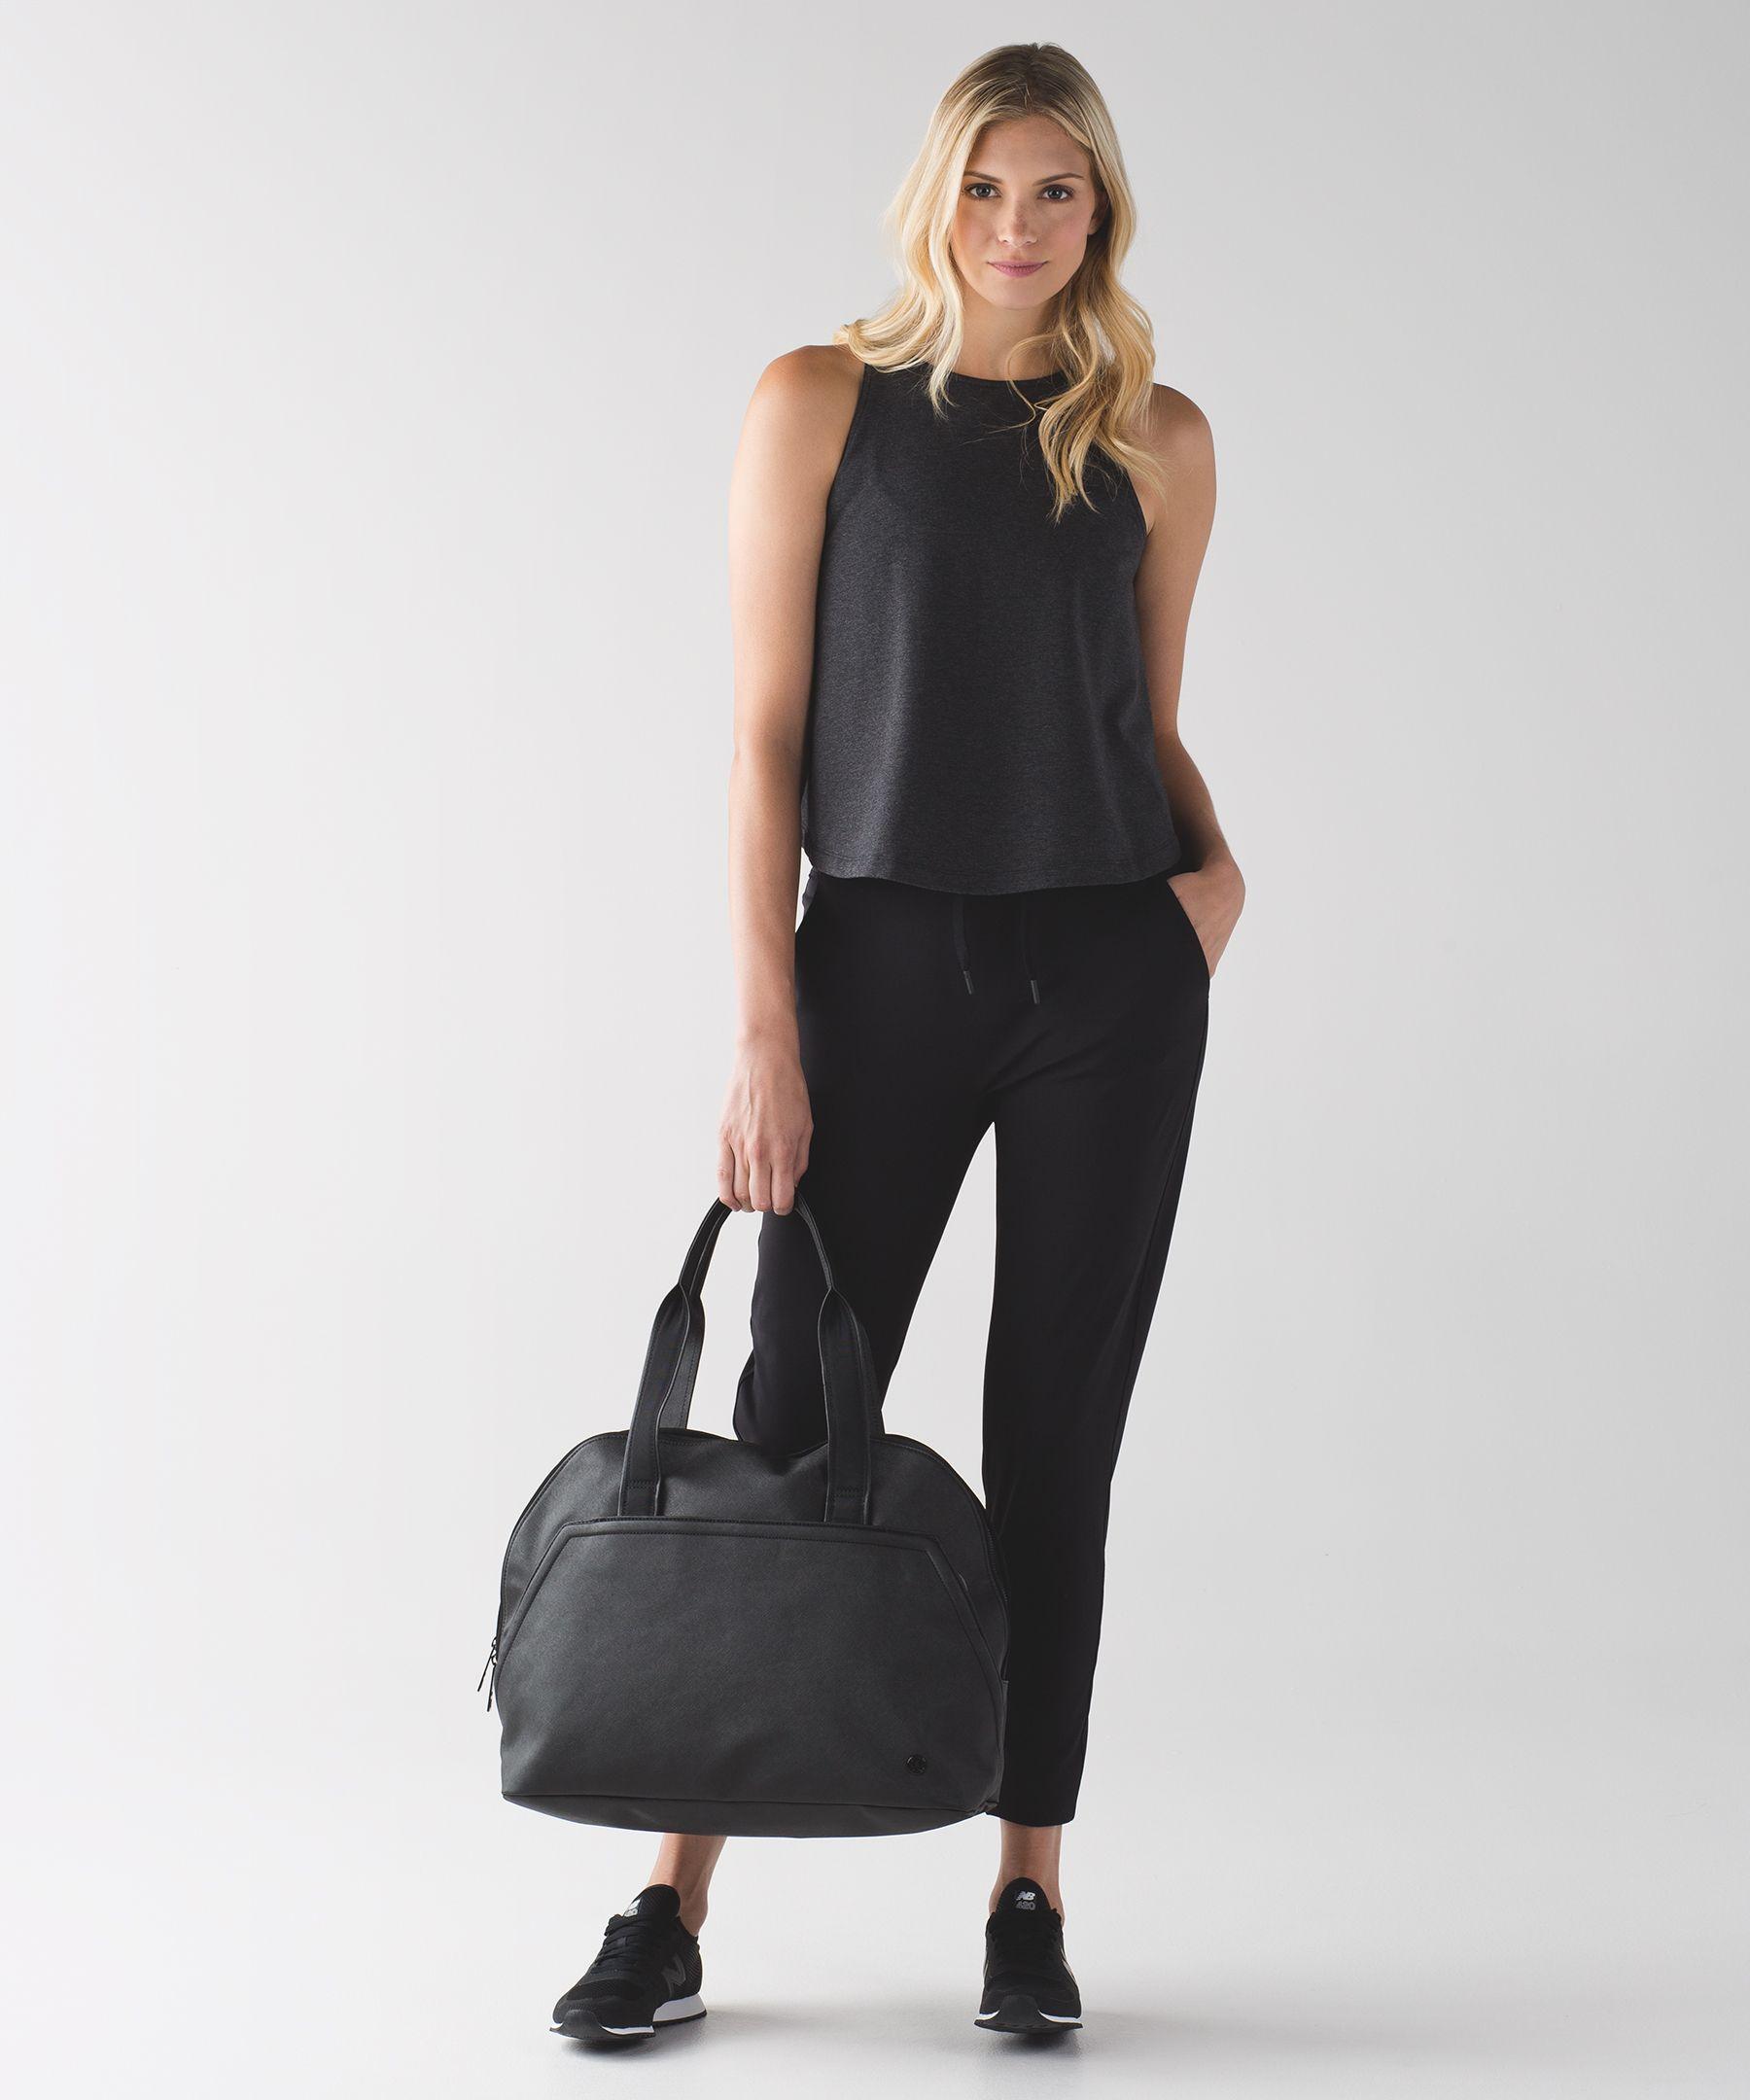 Yin Time Bag